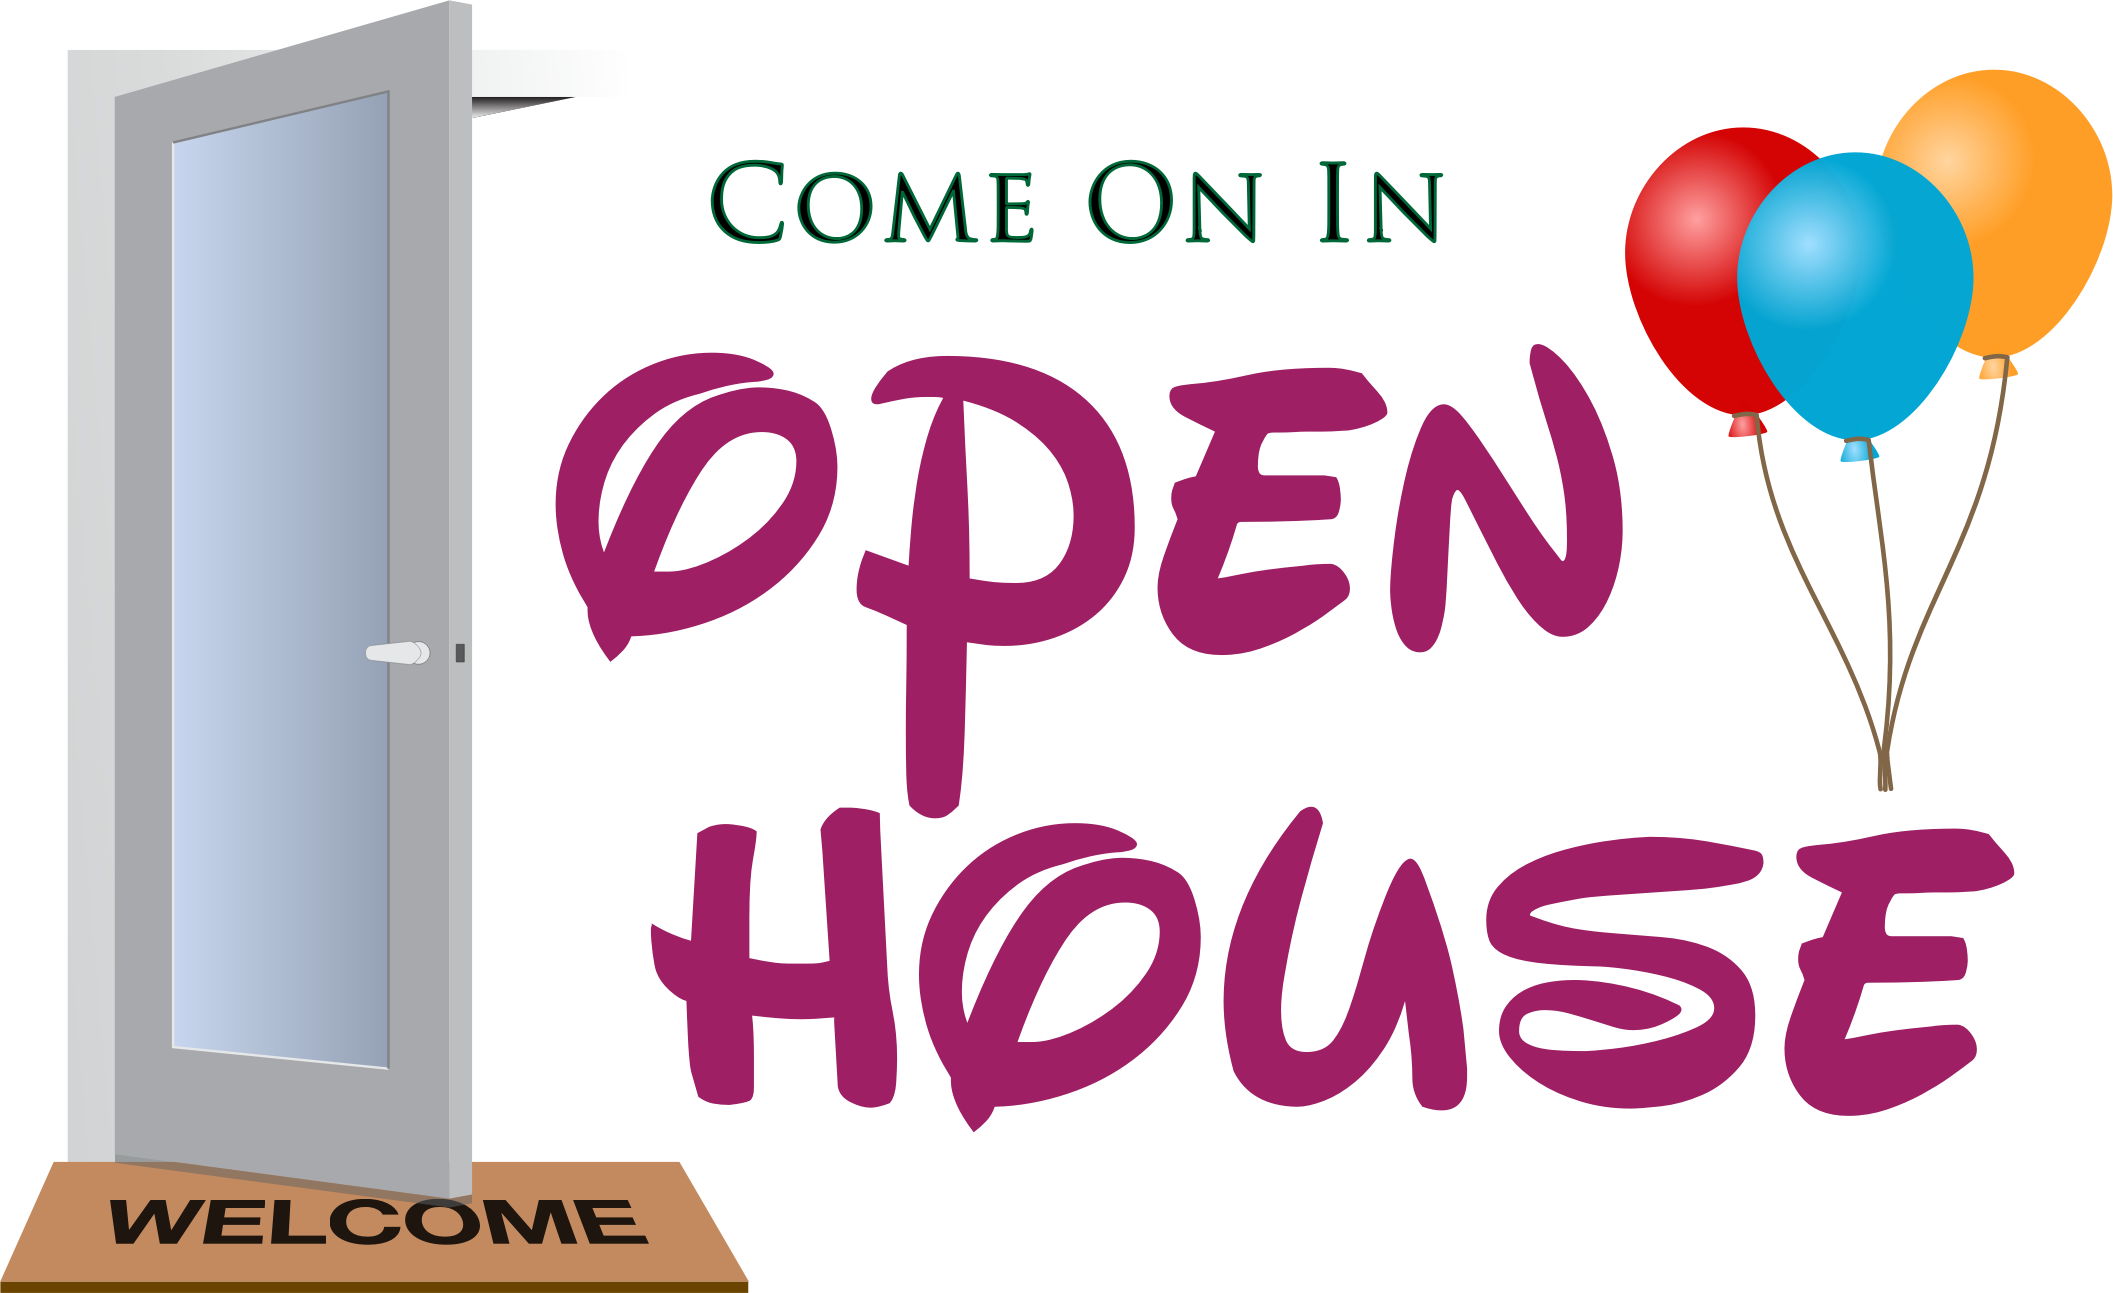 Open house clipart 5